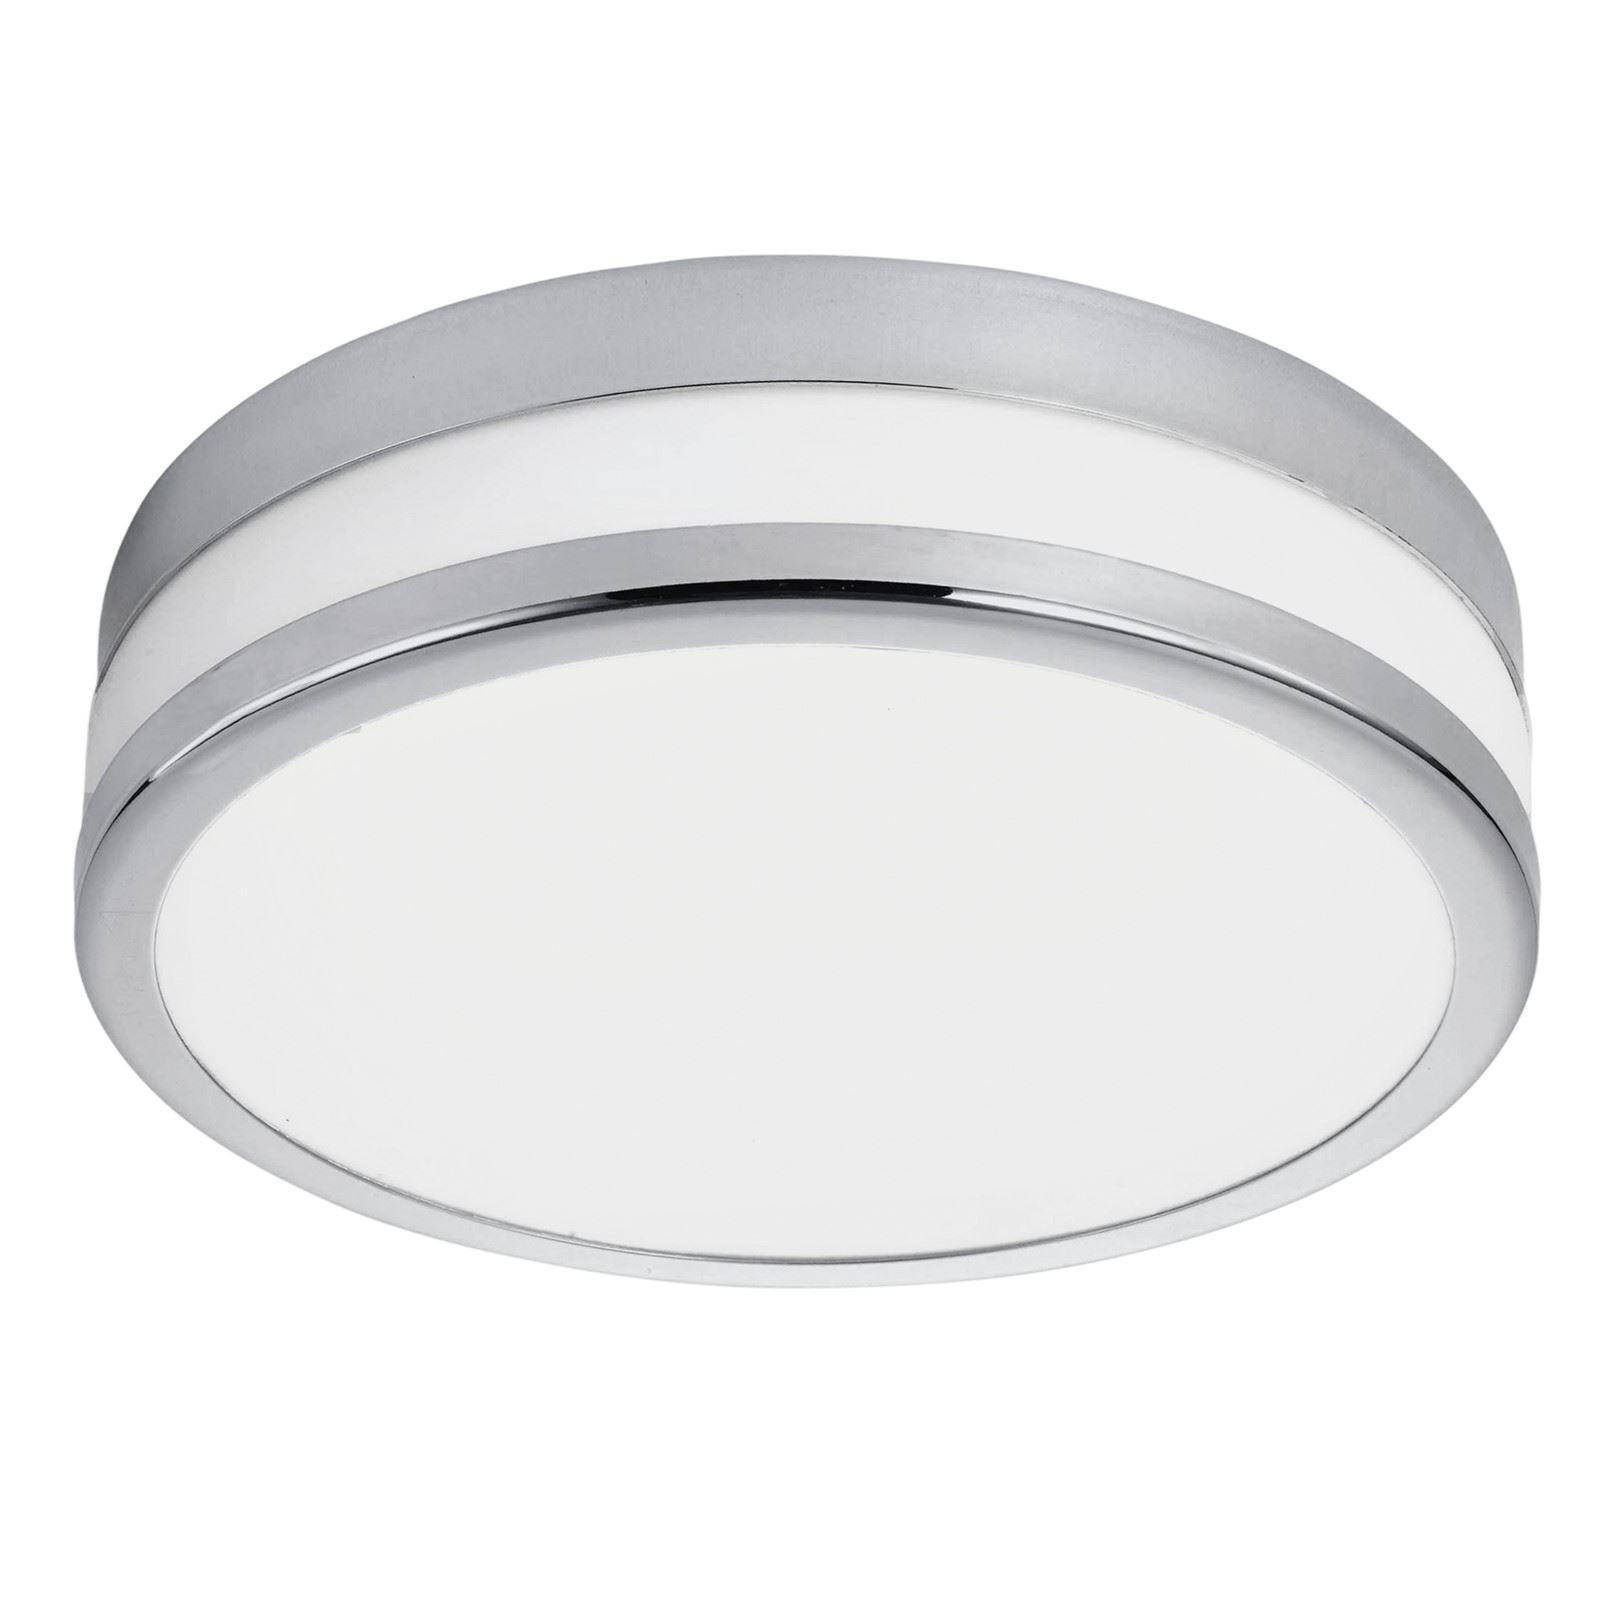 Palermo LED Ceiling Light Steel Chrome Coated White Shade Dia 225 mm